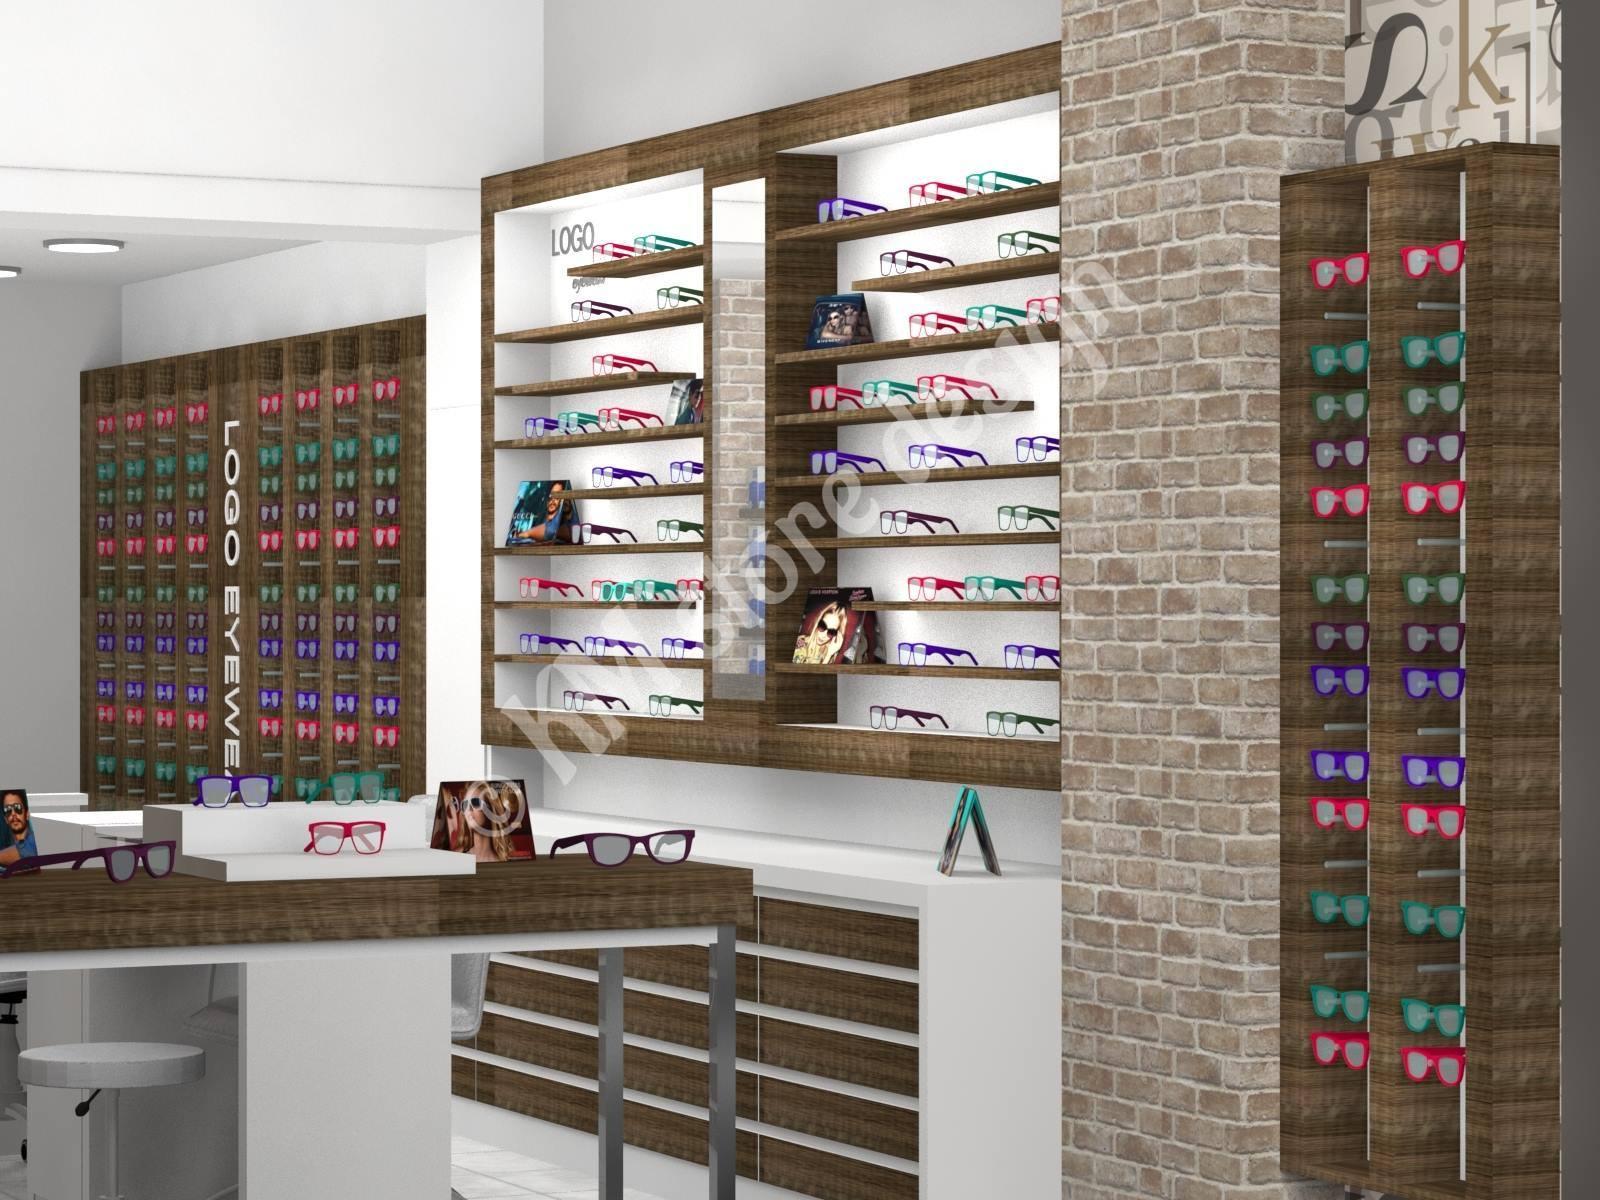 b3a8ff67fd Σχεδιασμός Καταστήματος με Οπτικά Καλλιθέα - KM store design